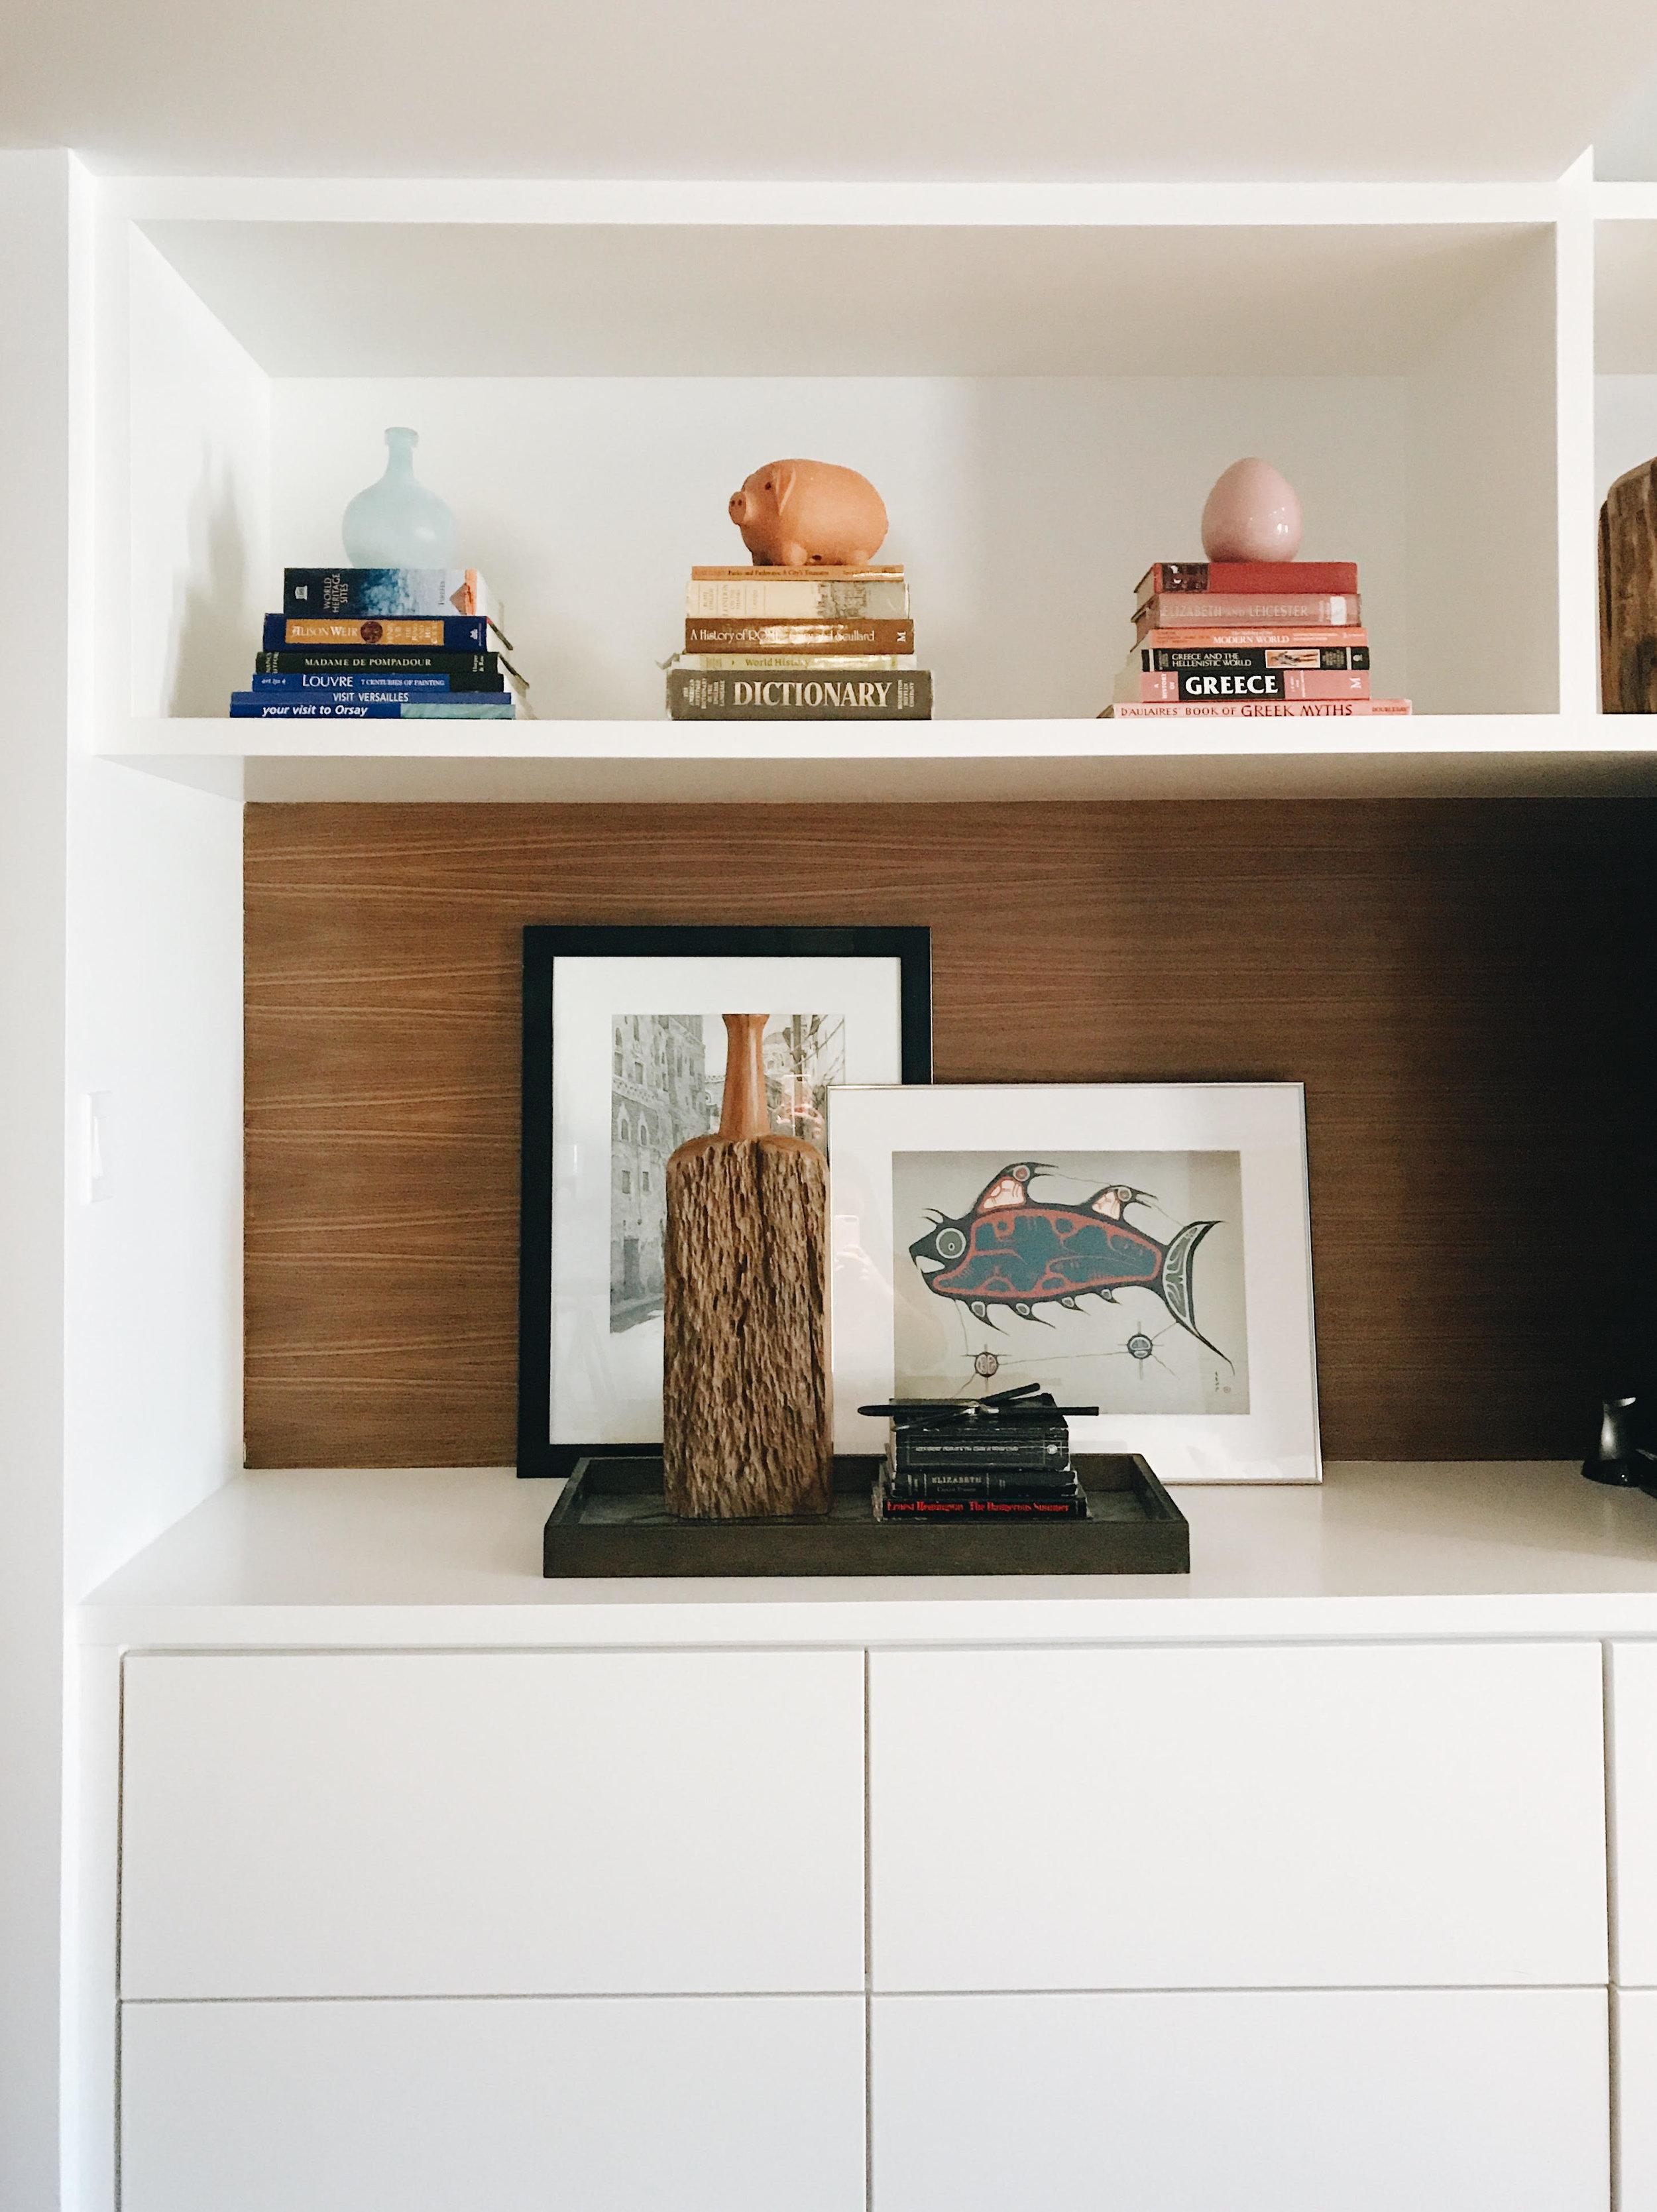 Bookshelf *after*, Nyla Free Designs Inc., Calgary Interior Designer, Before & After